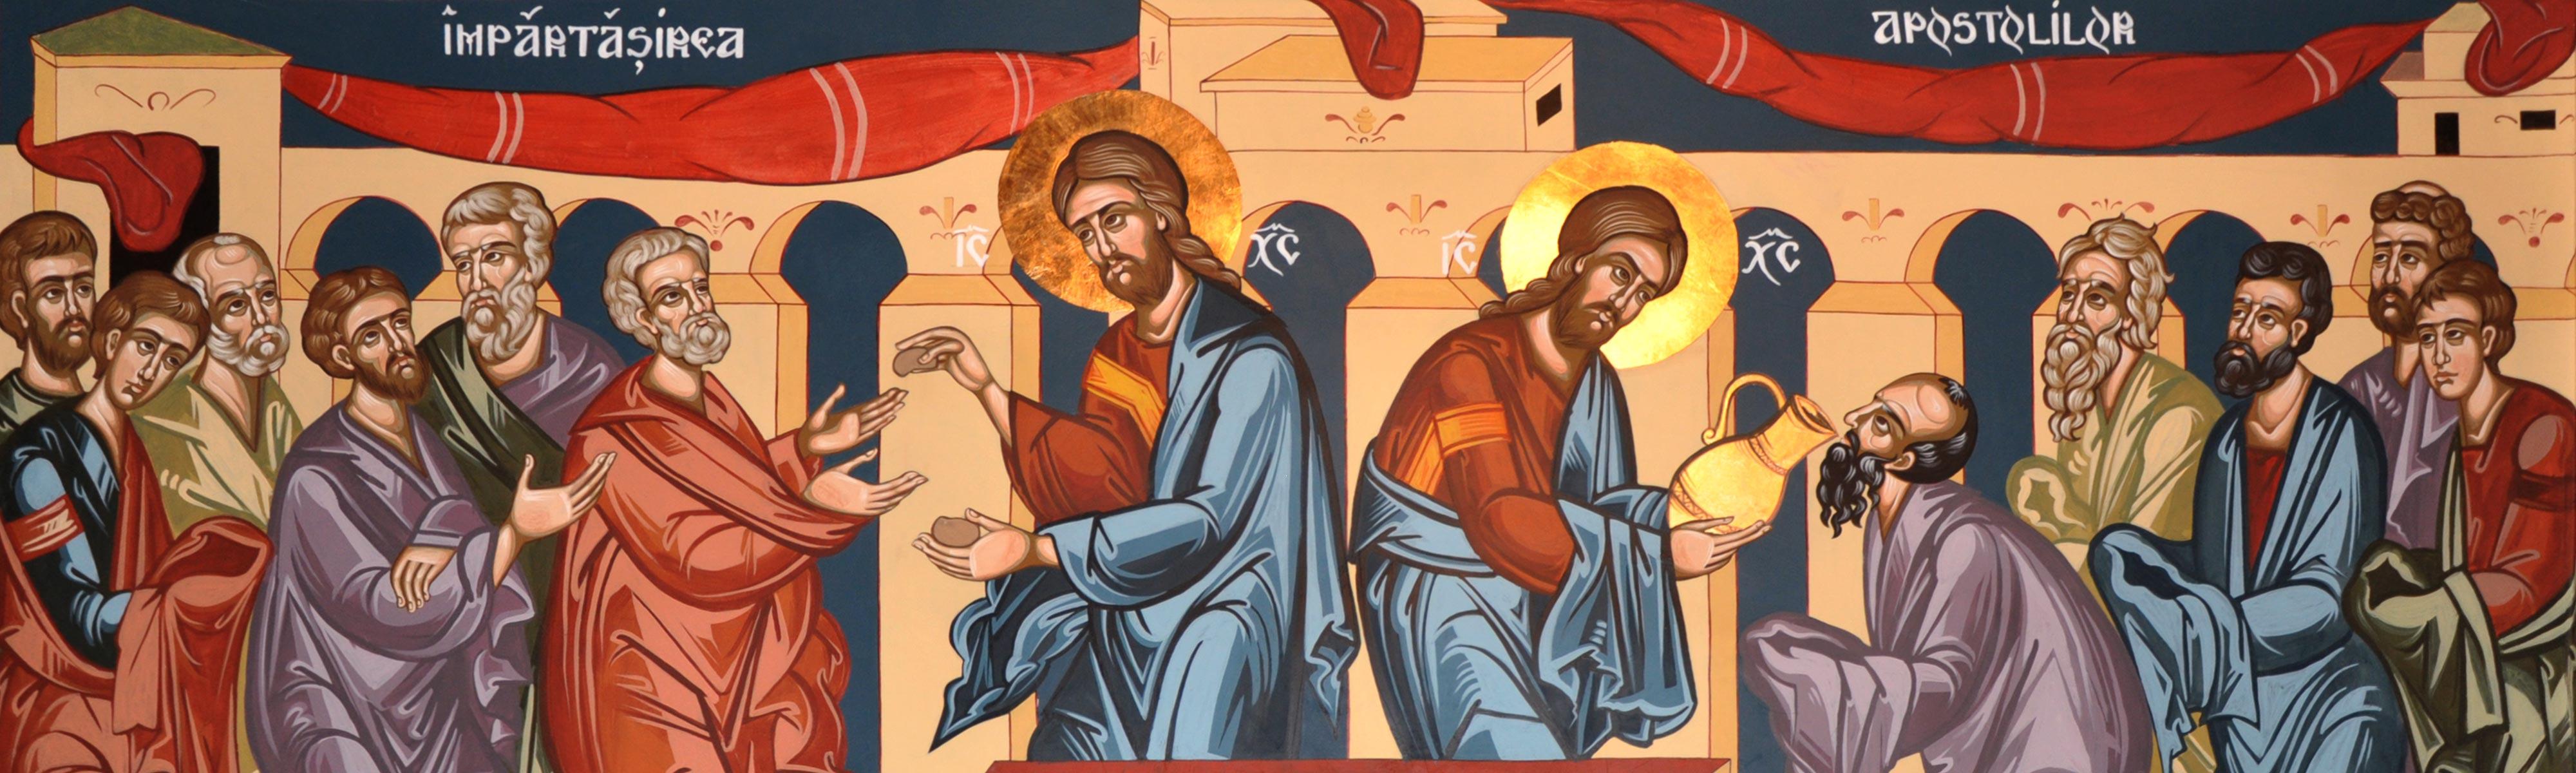 Impartasirea-apostolilor